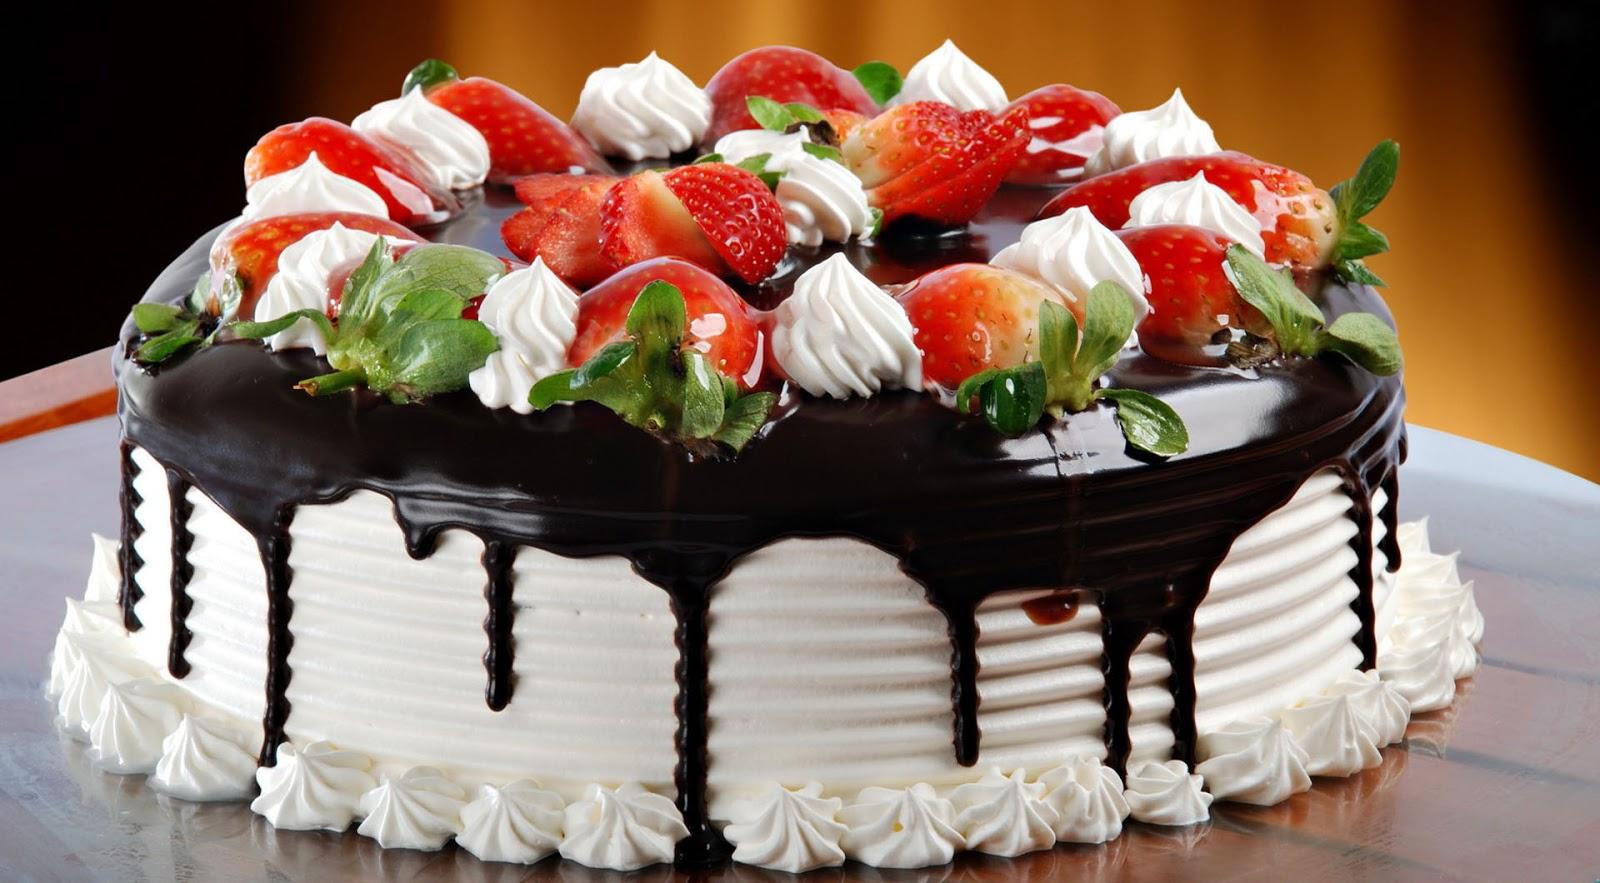 Gambar Gambar Kue Ulang Tahun Lengkap